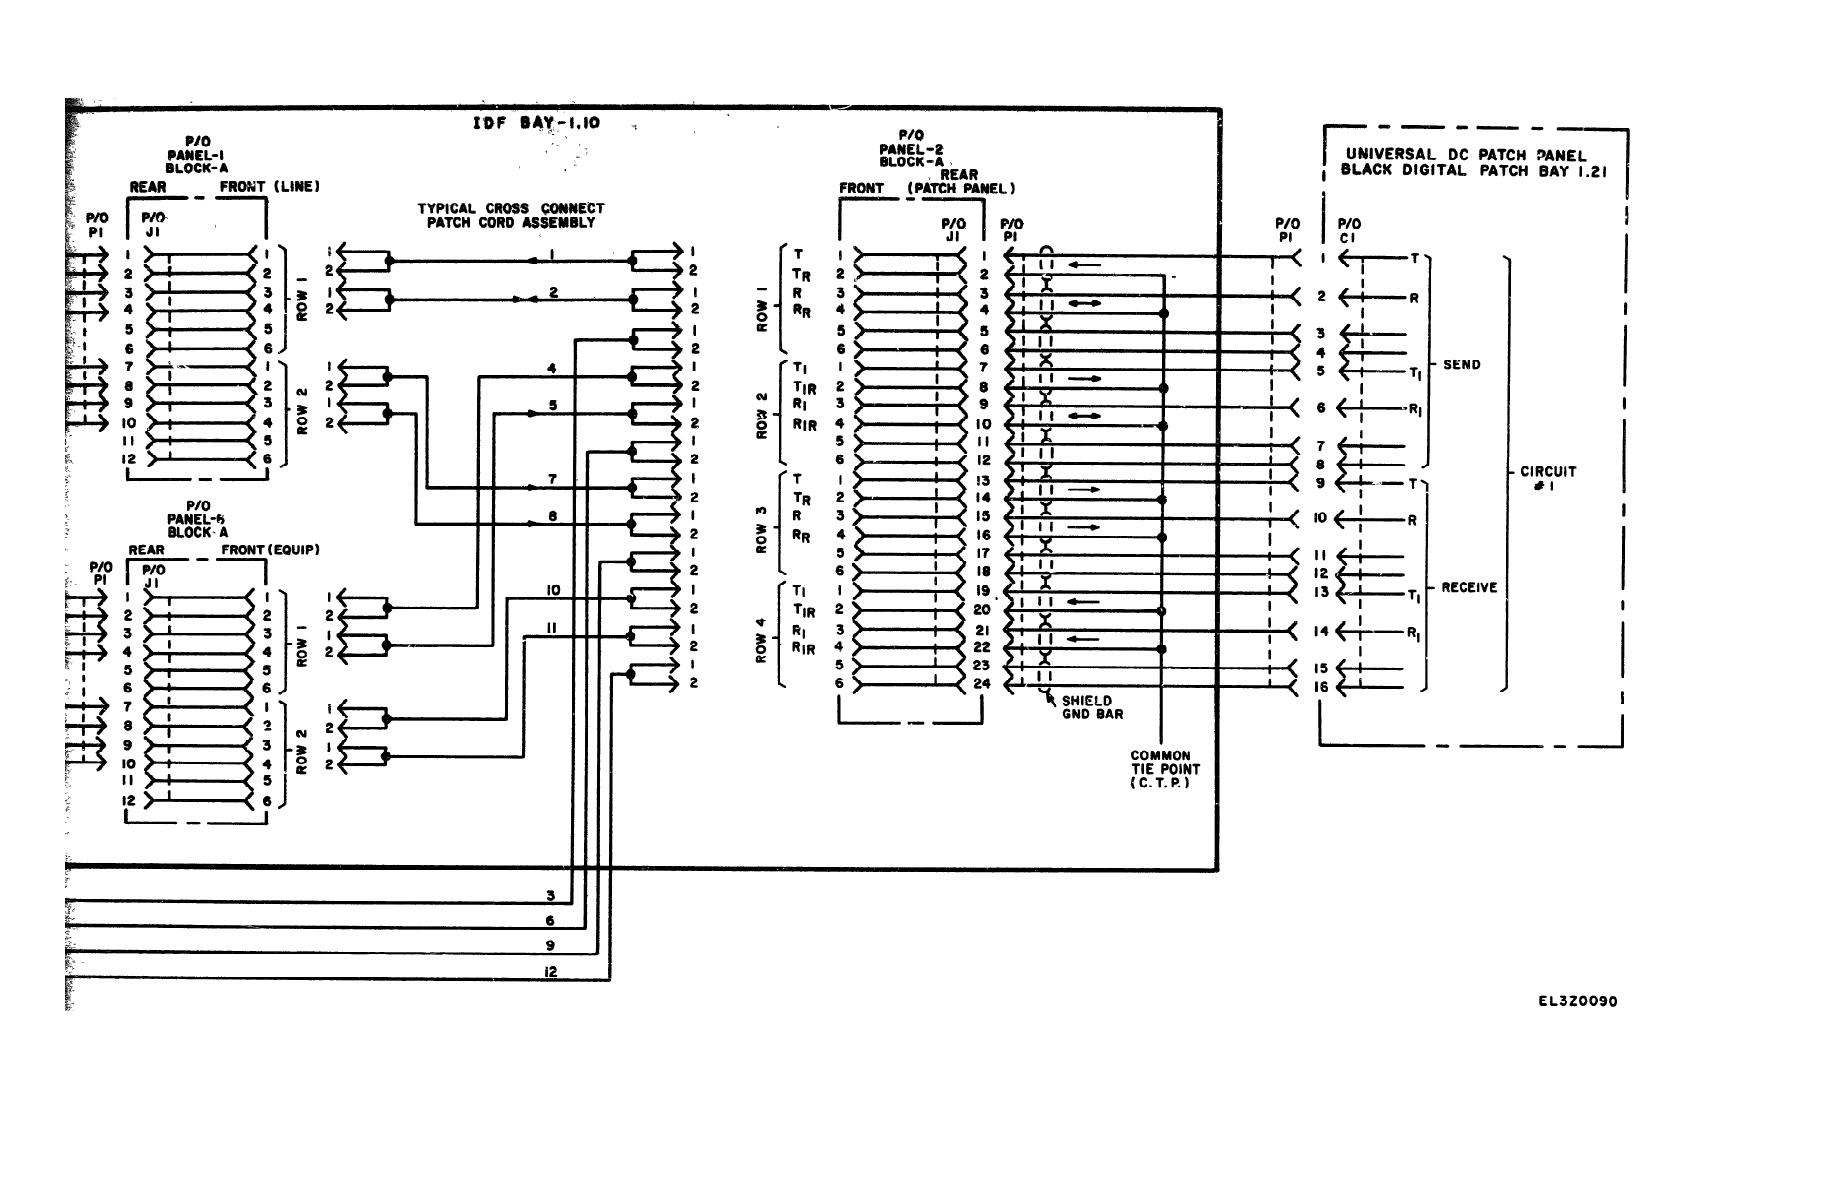 figure fo 13  typical black digital circuit idf connection diagram